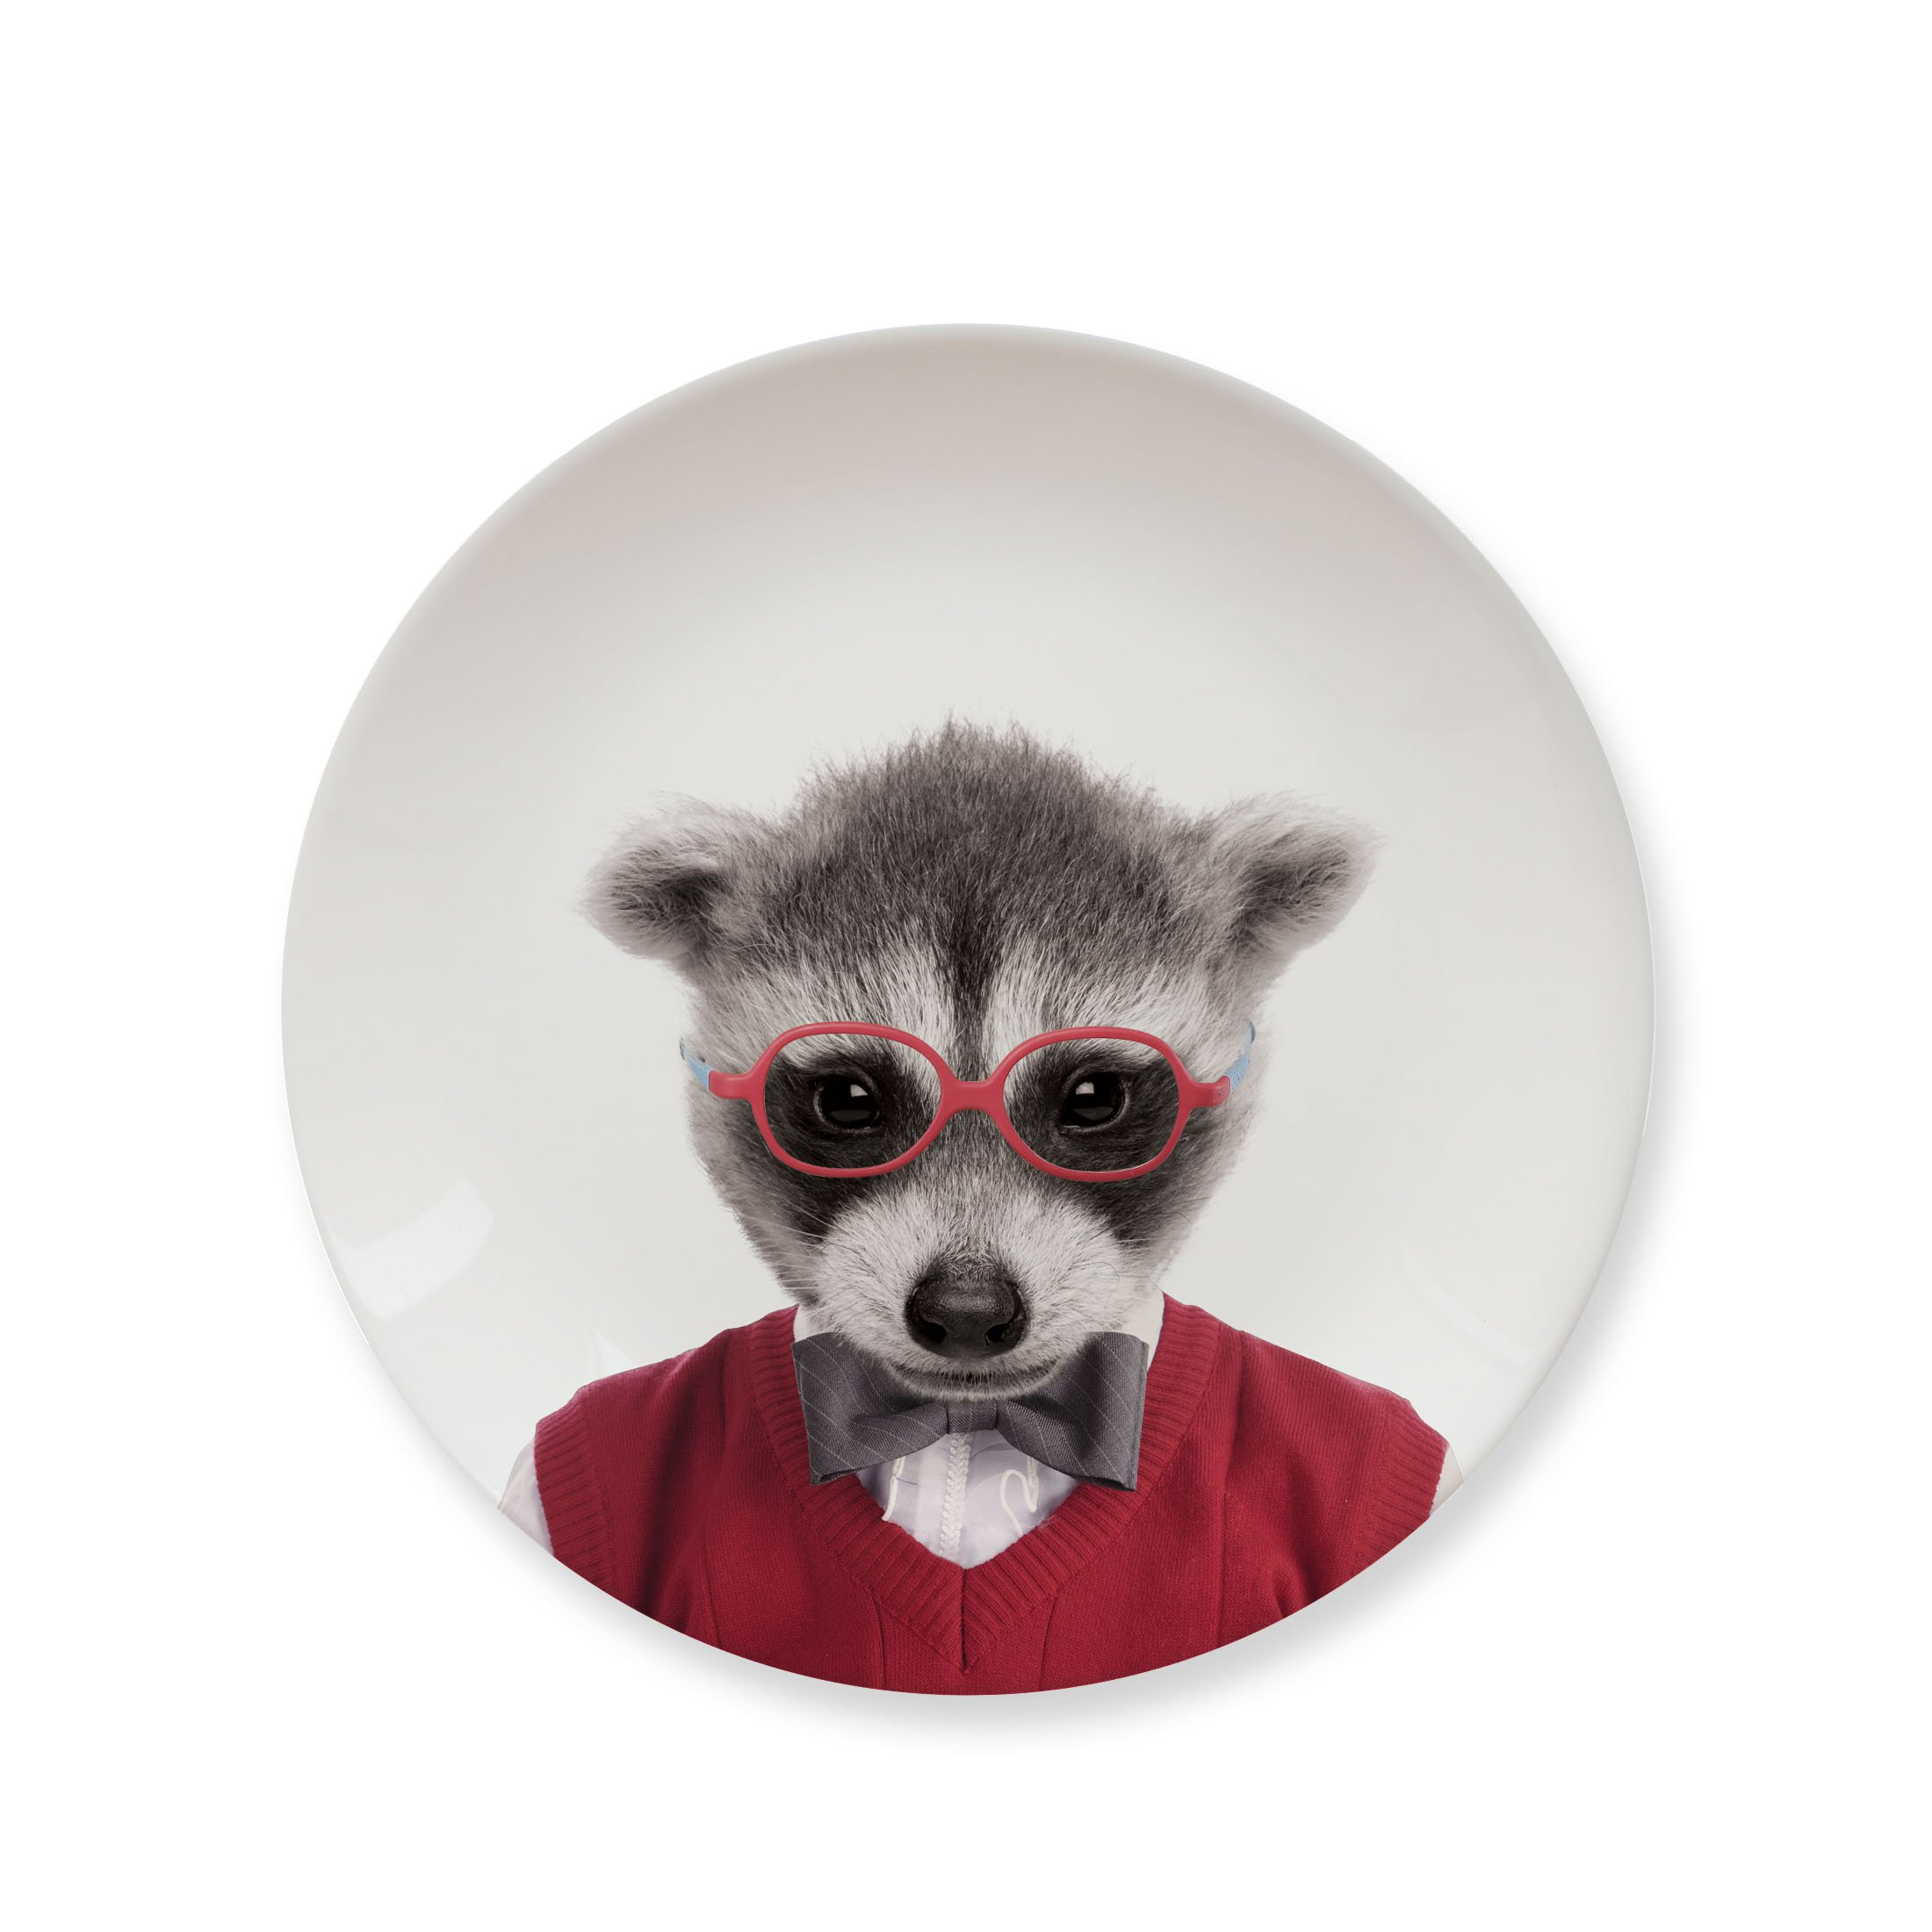 MUSTARD Ceramic Dinner Plate I Dishwasher safe I Dinnerware - Wild Dining Raccoon